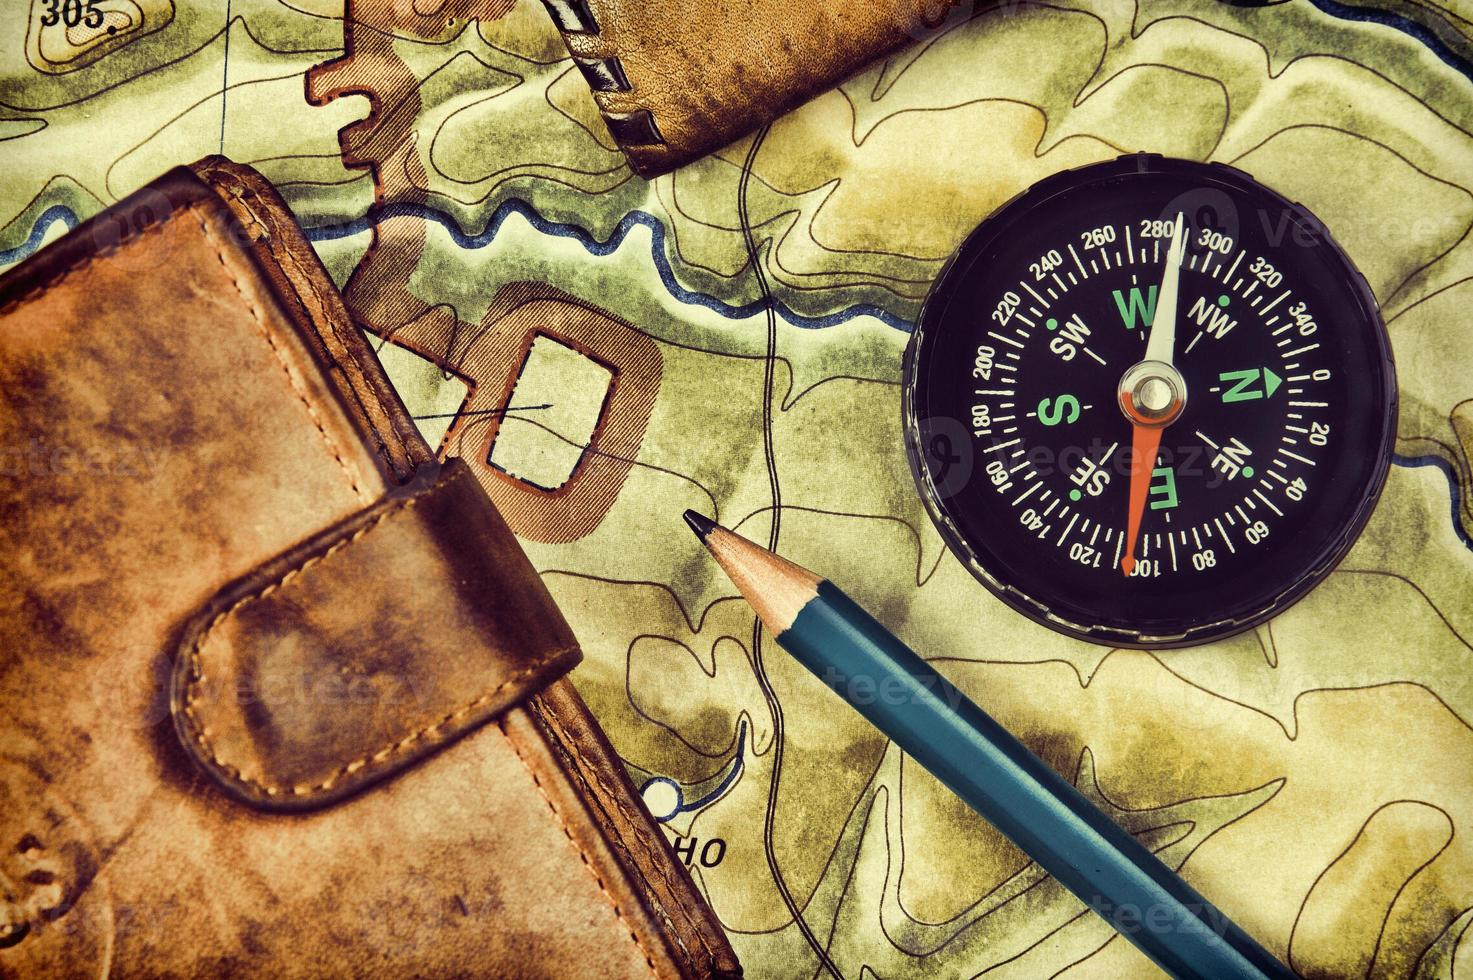 kompass plånbok och pass på den gamla kartan foto